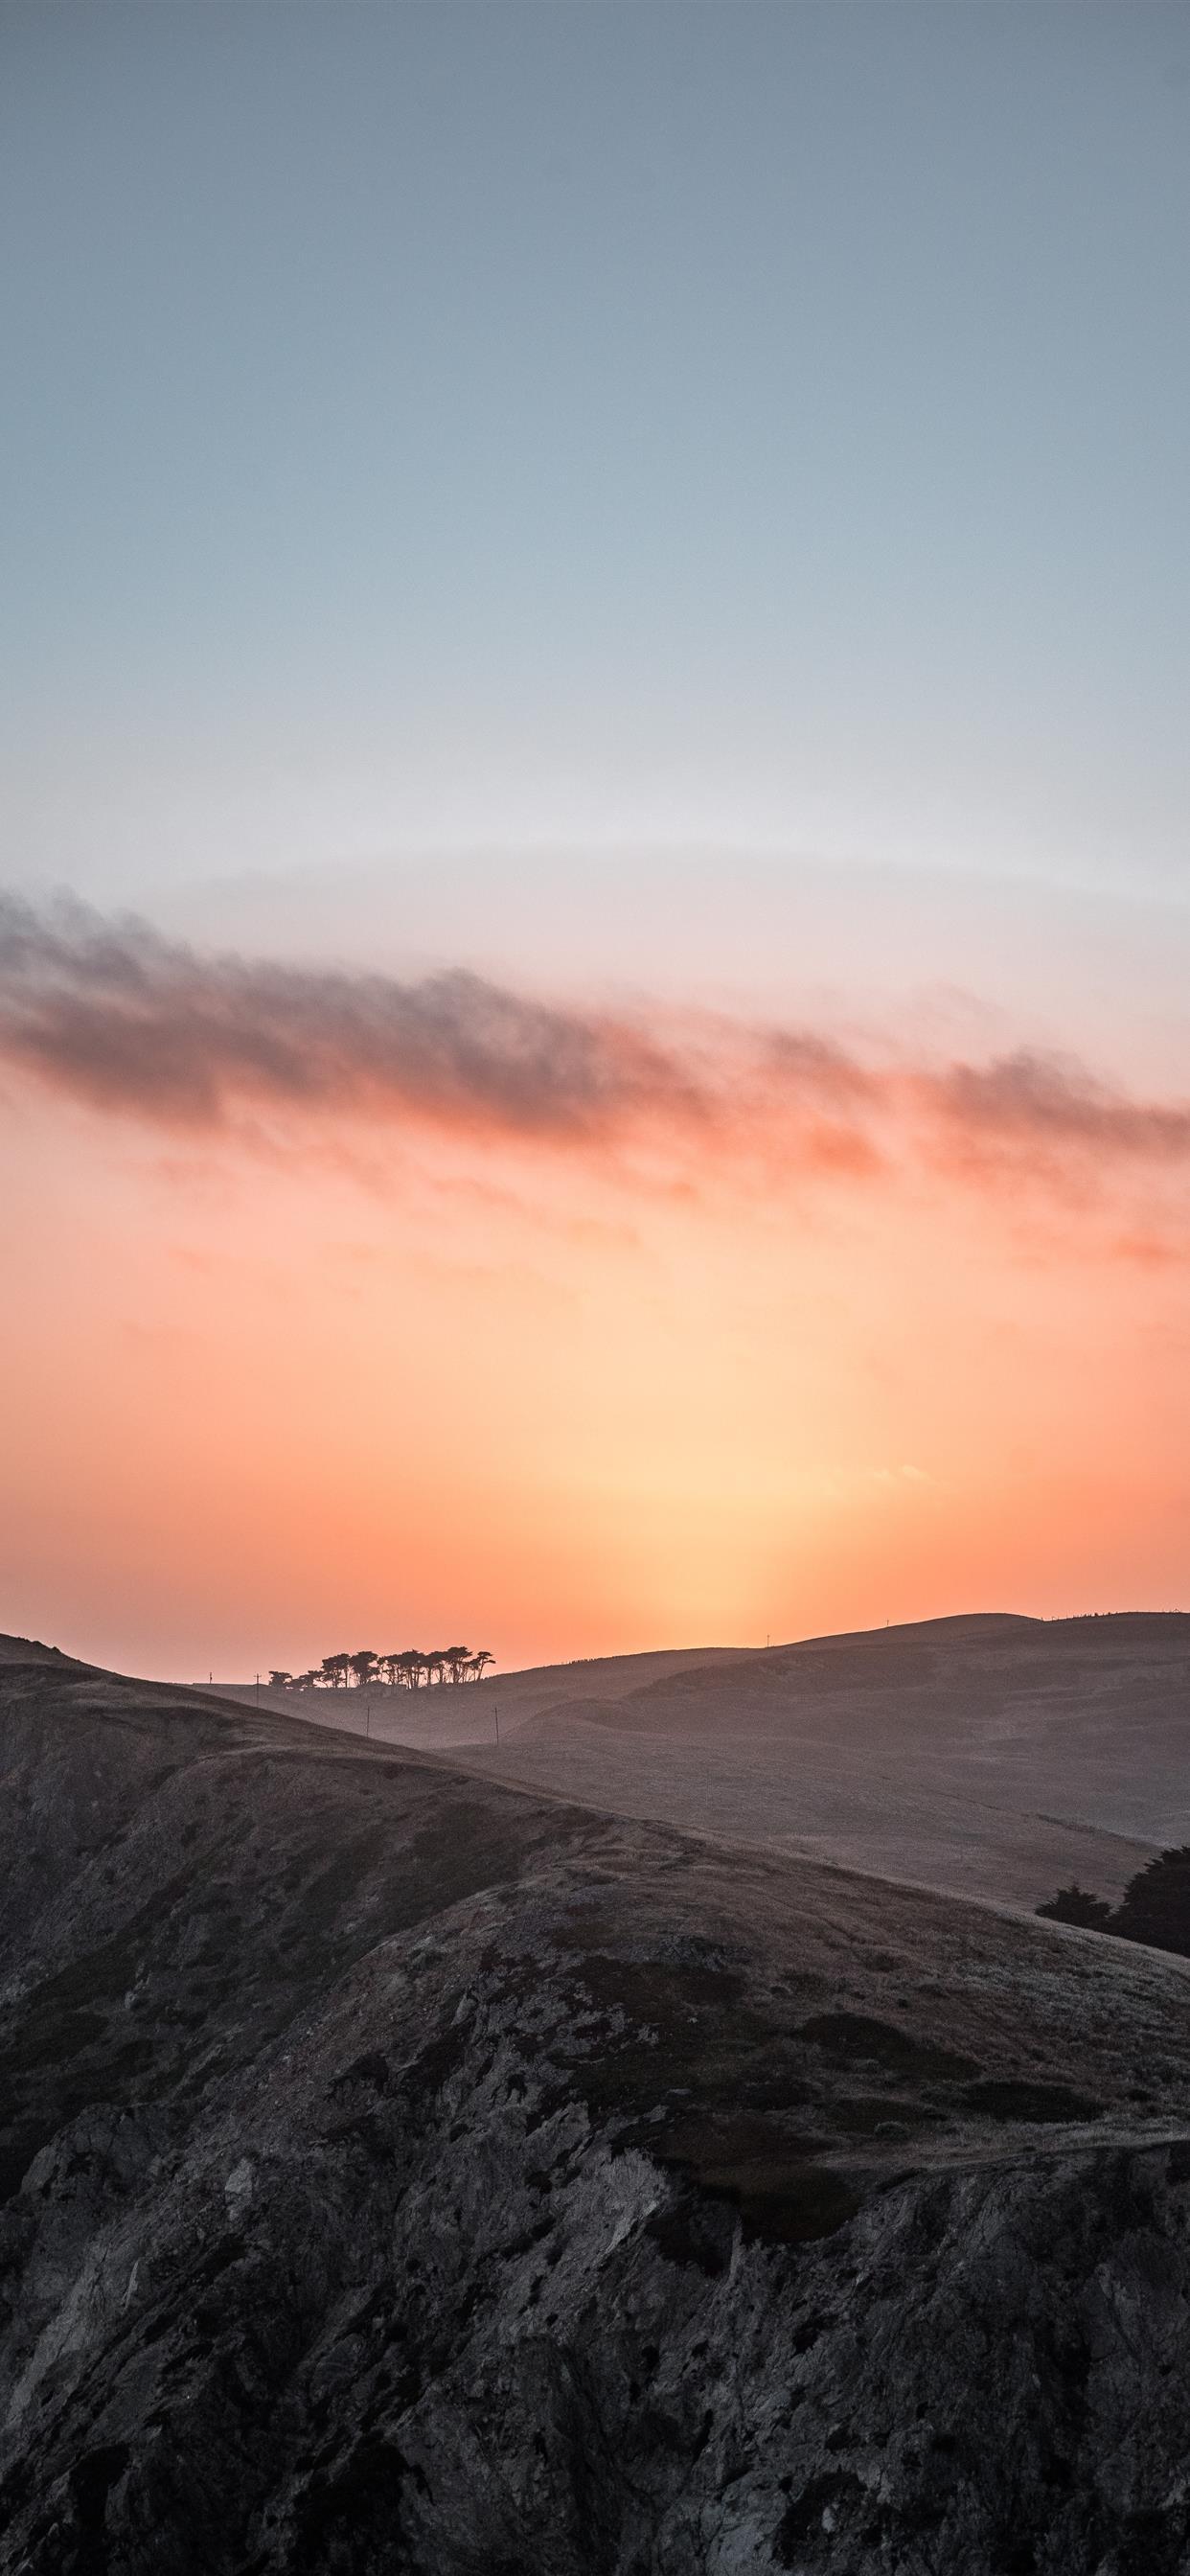 Soft Sunset iphone xs max wallpaper